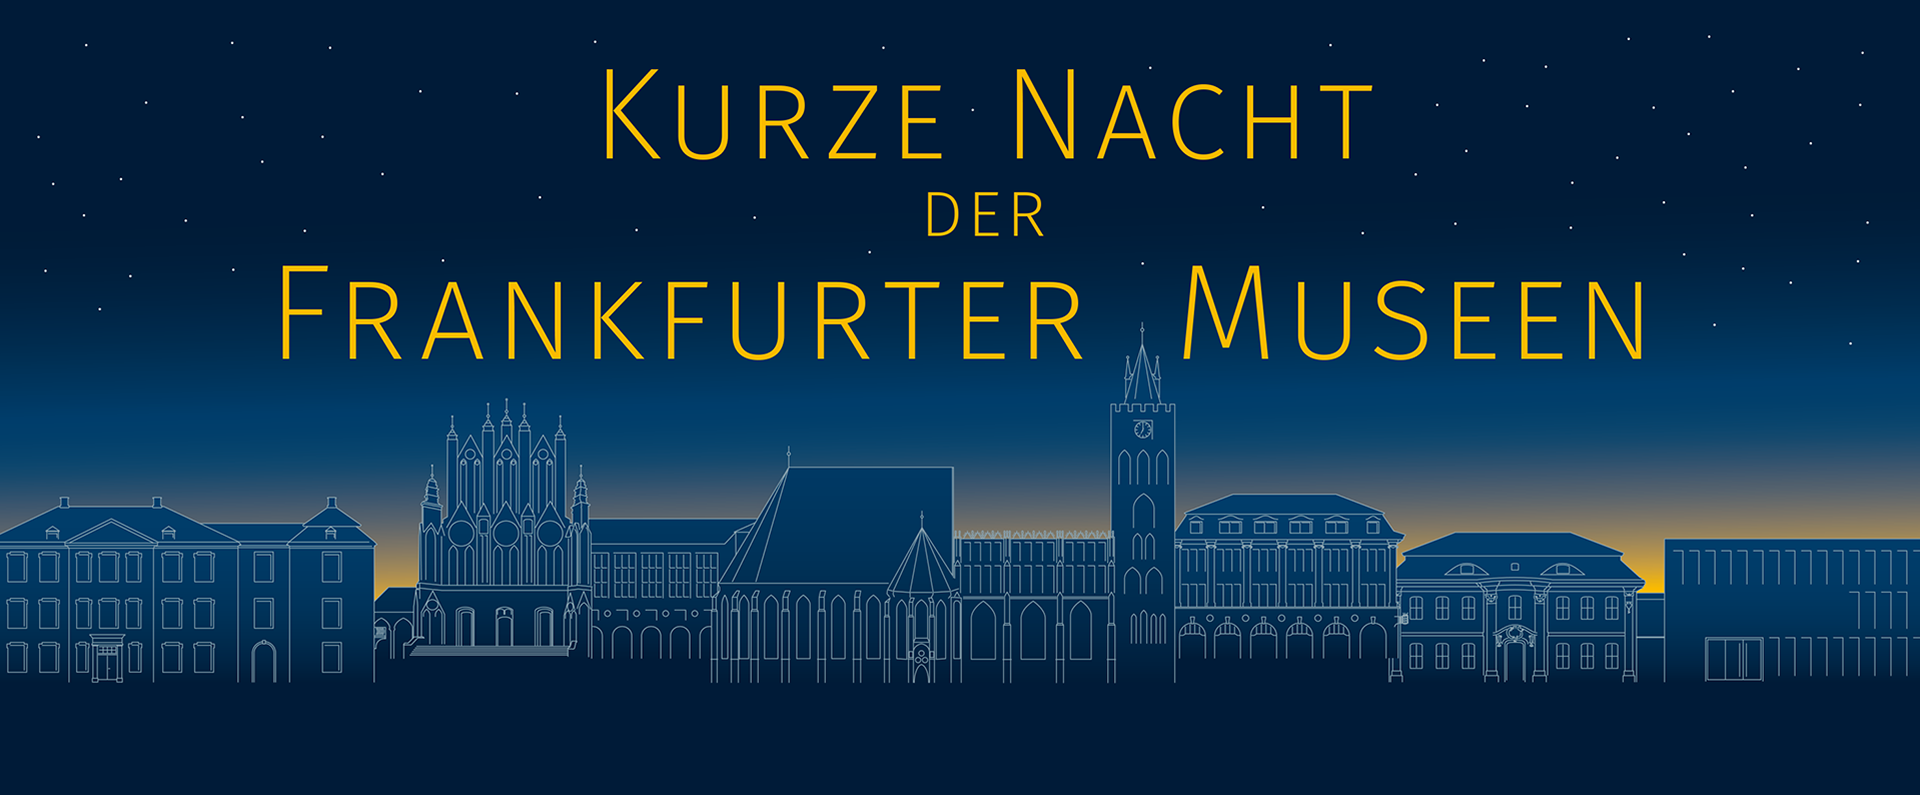 Kurze Nacht der Frankfurter Museen